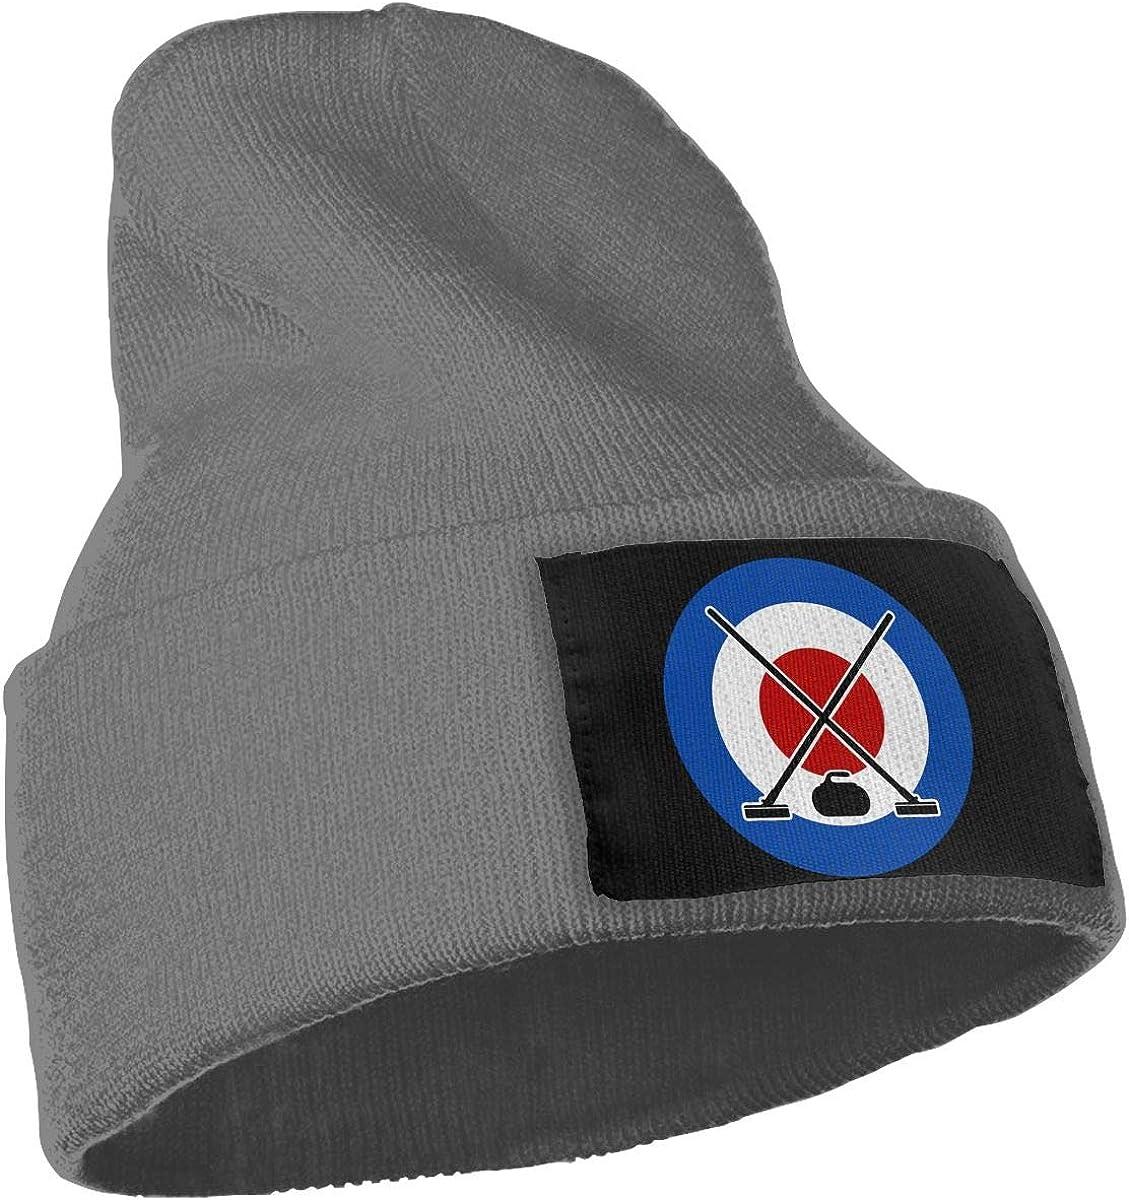 Curling Sport Fashion Skull Beanie WHOO93@Y Mens Womens 100/% Acrylic Knit Hat Cap